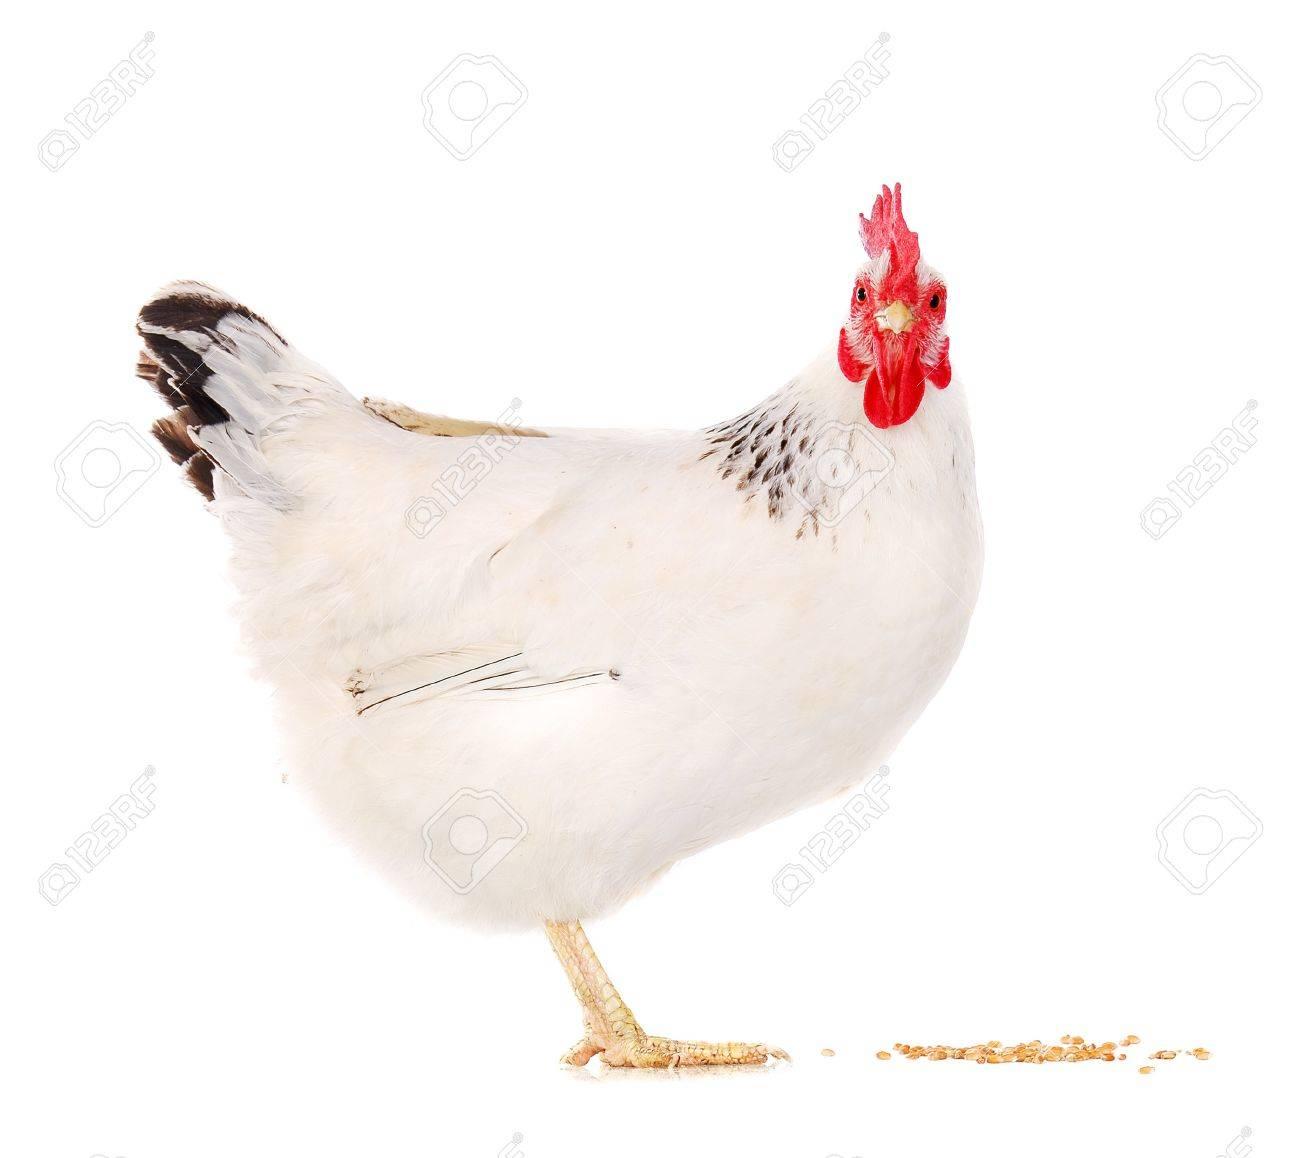 white hen eating wheat grains White Hen